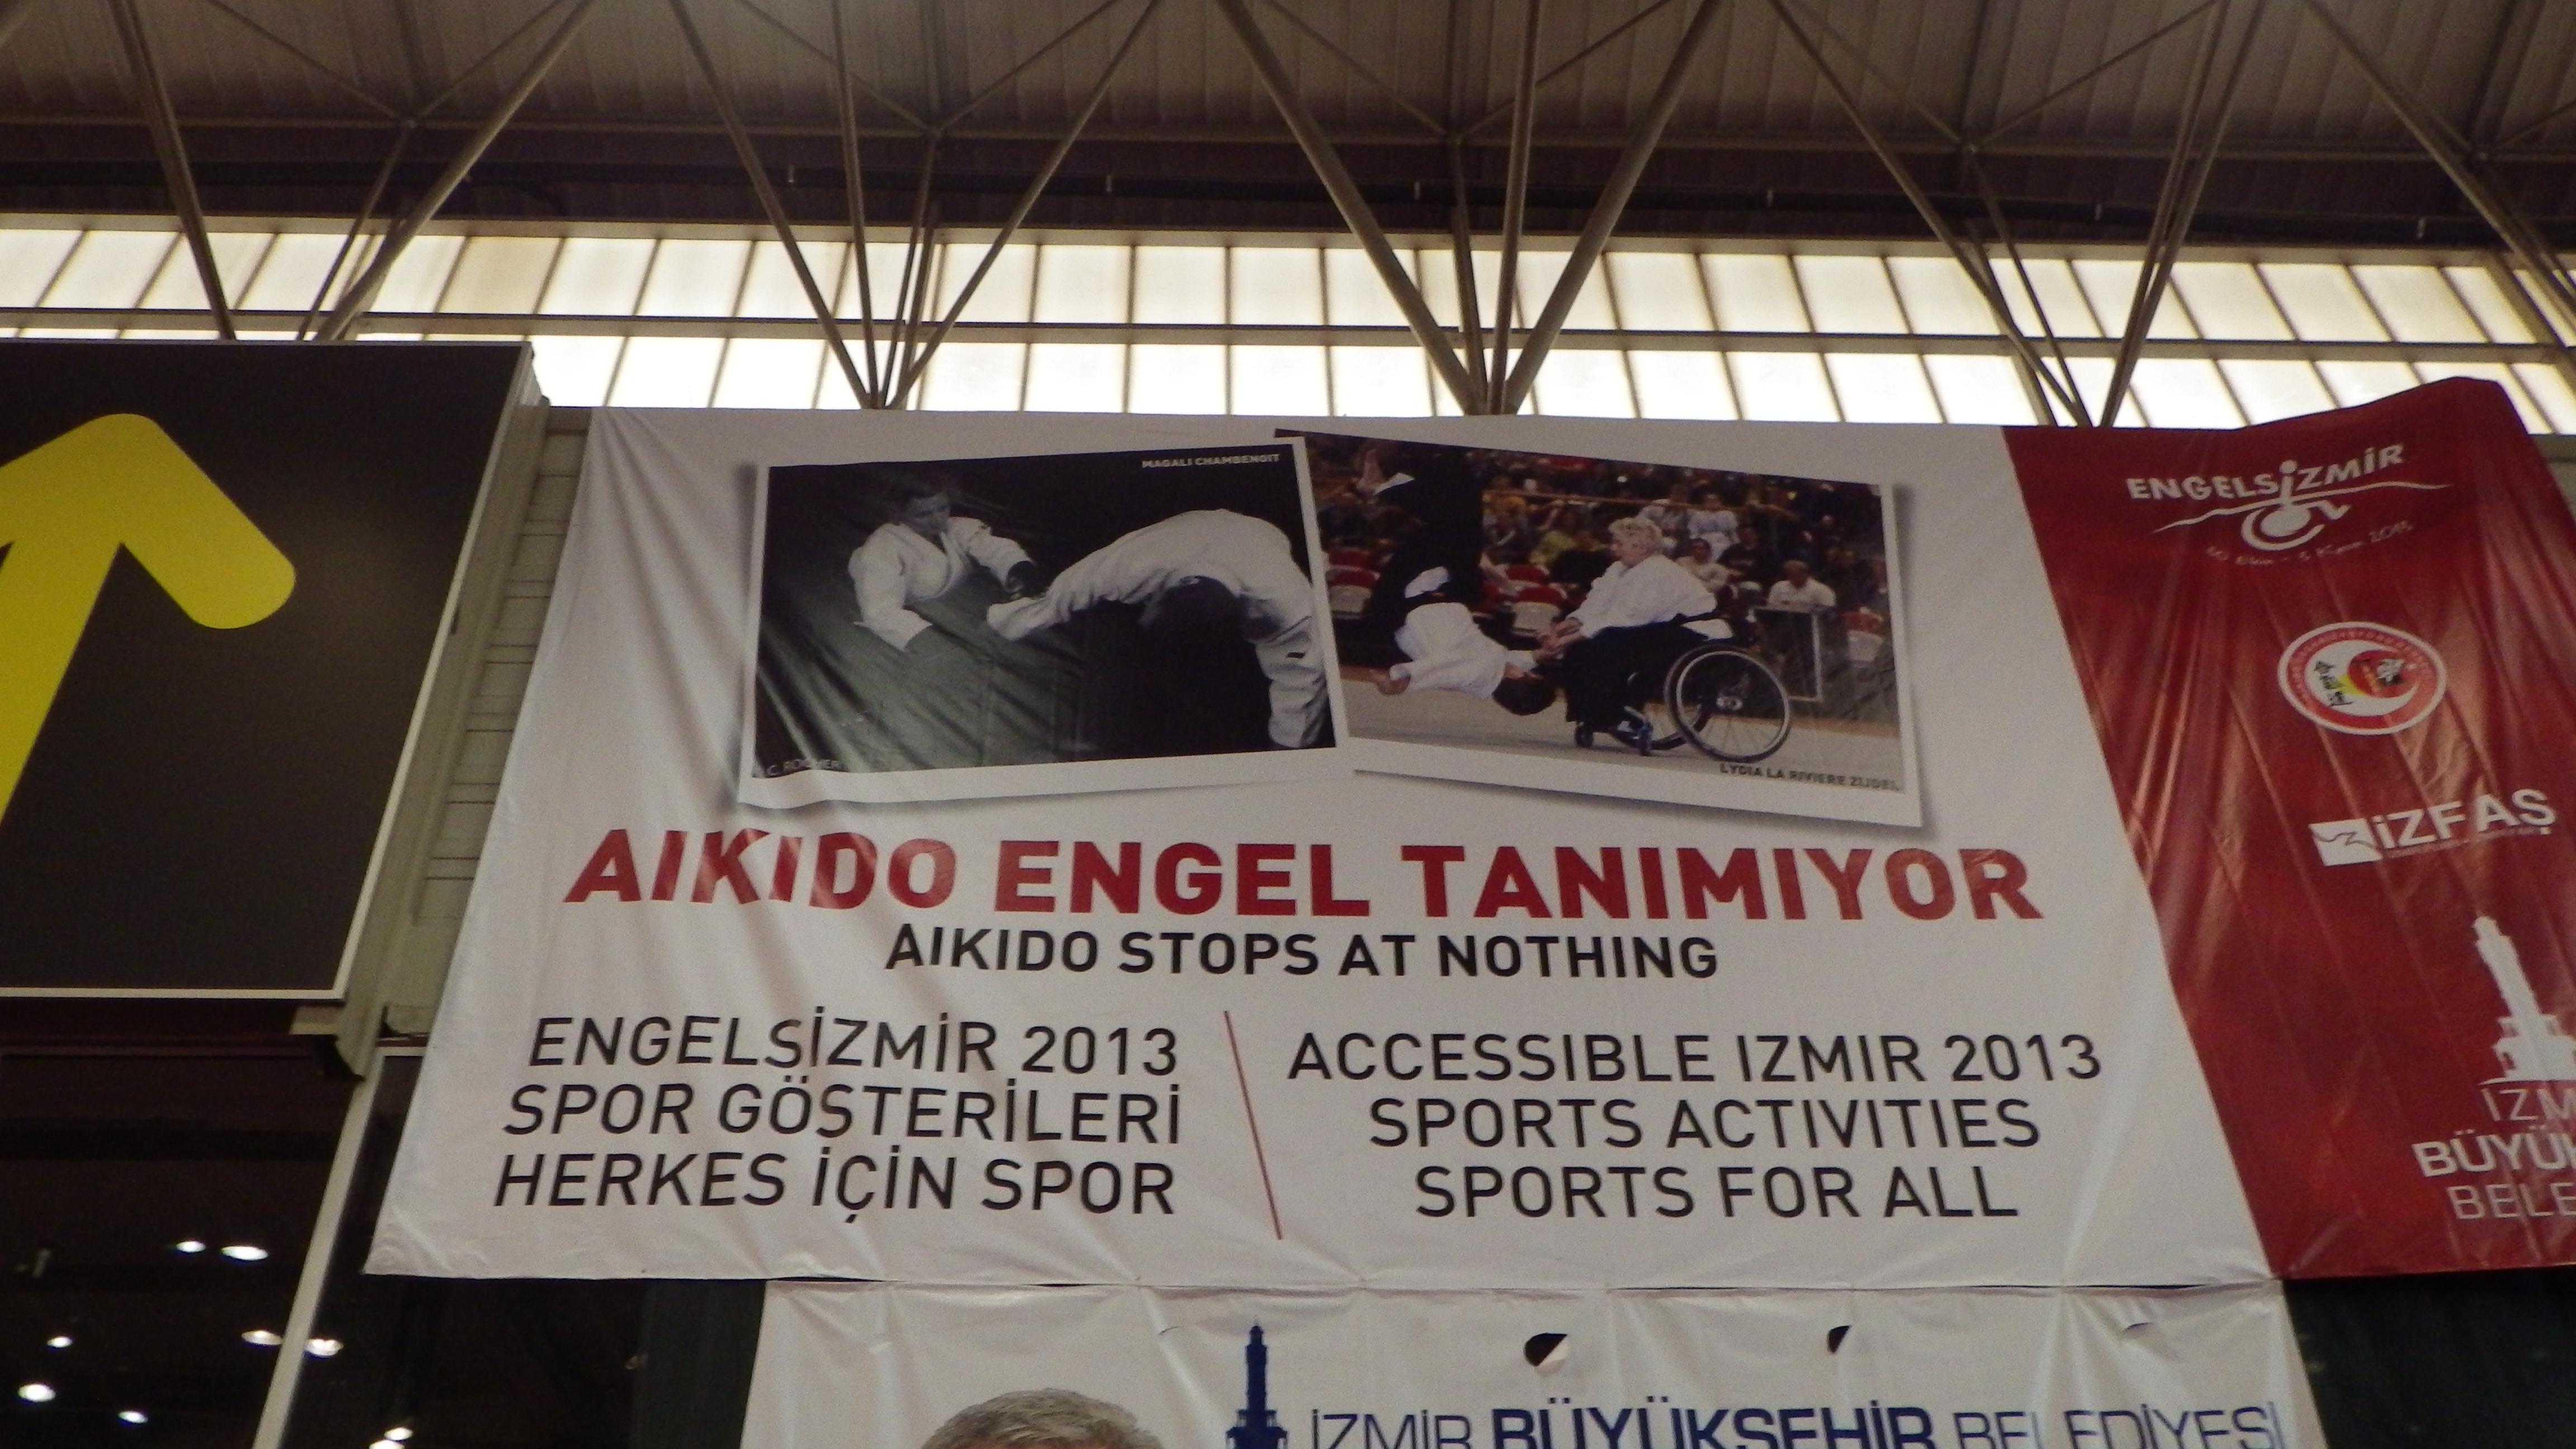 Aikido Engel Tanimyor